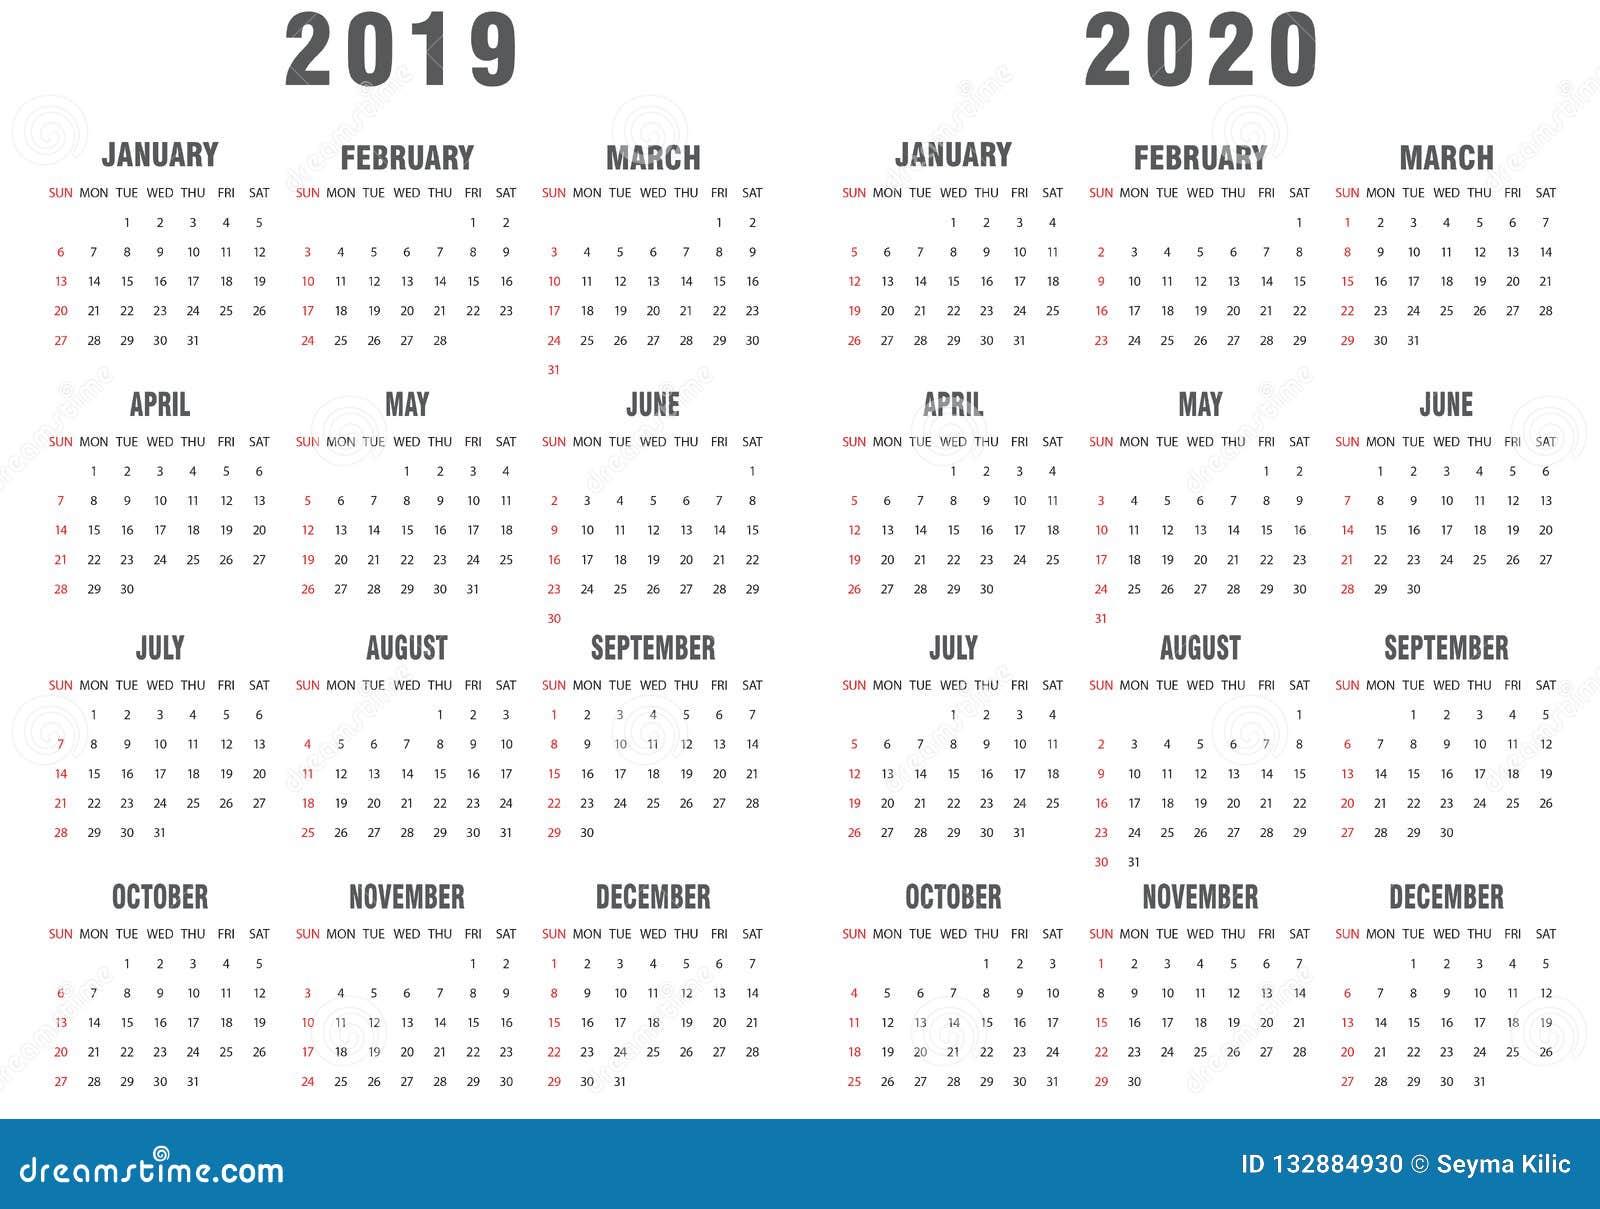 2019-2020 Calendar Gray and White